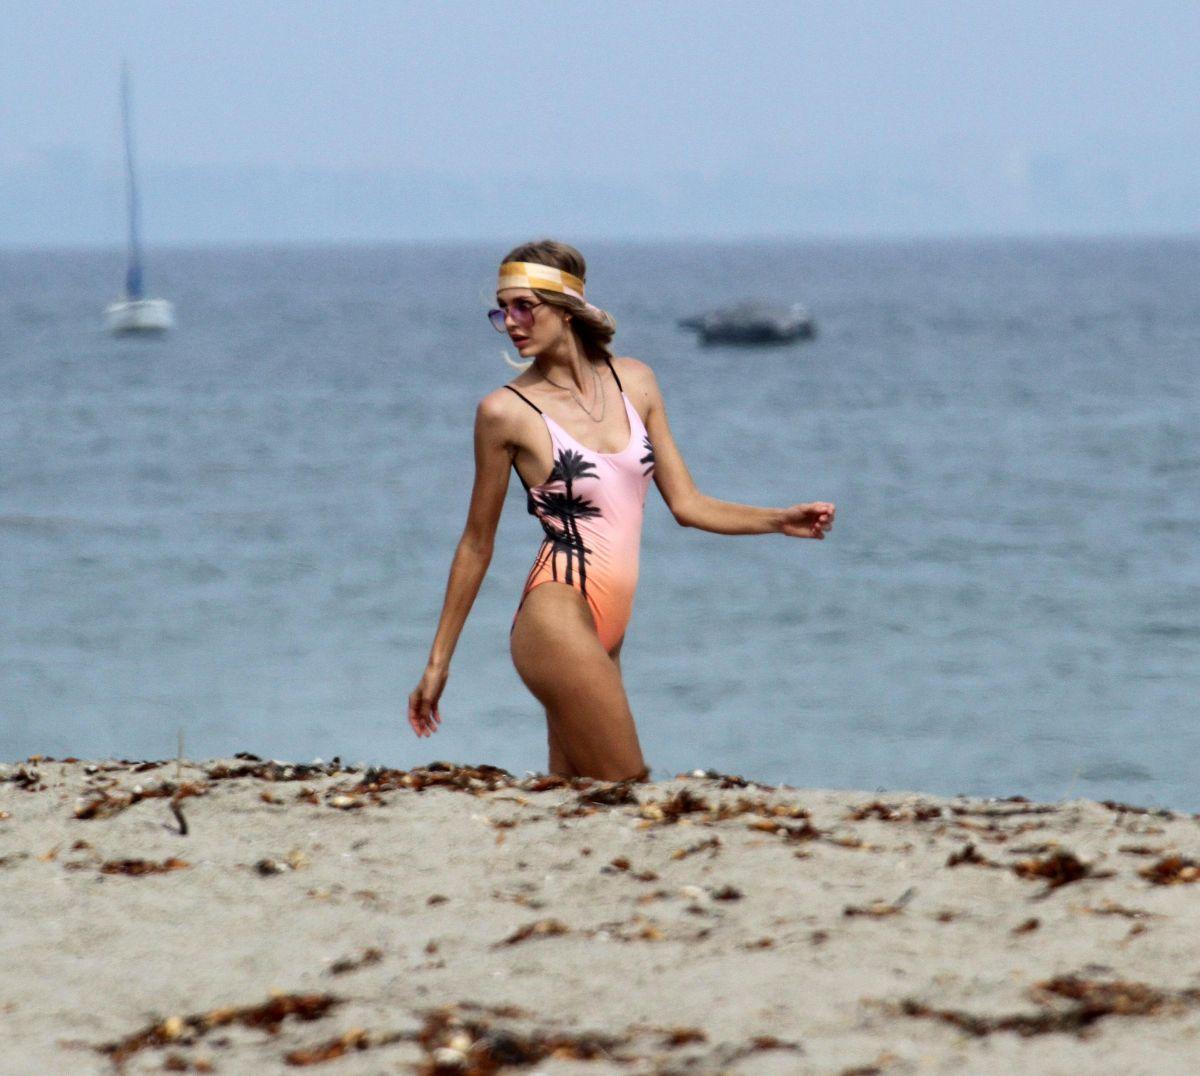 Elsa hosk posing in a bikini malibu - 2019 year